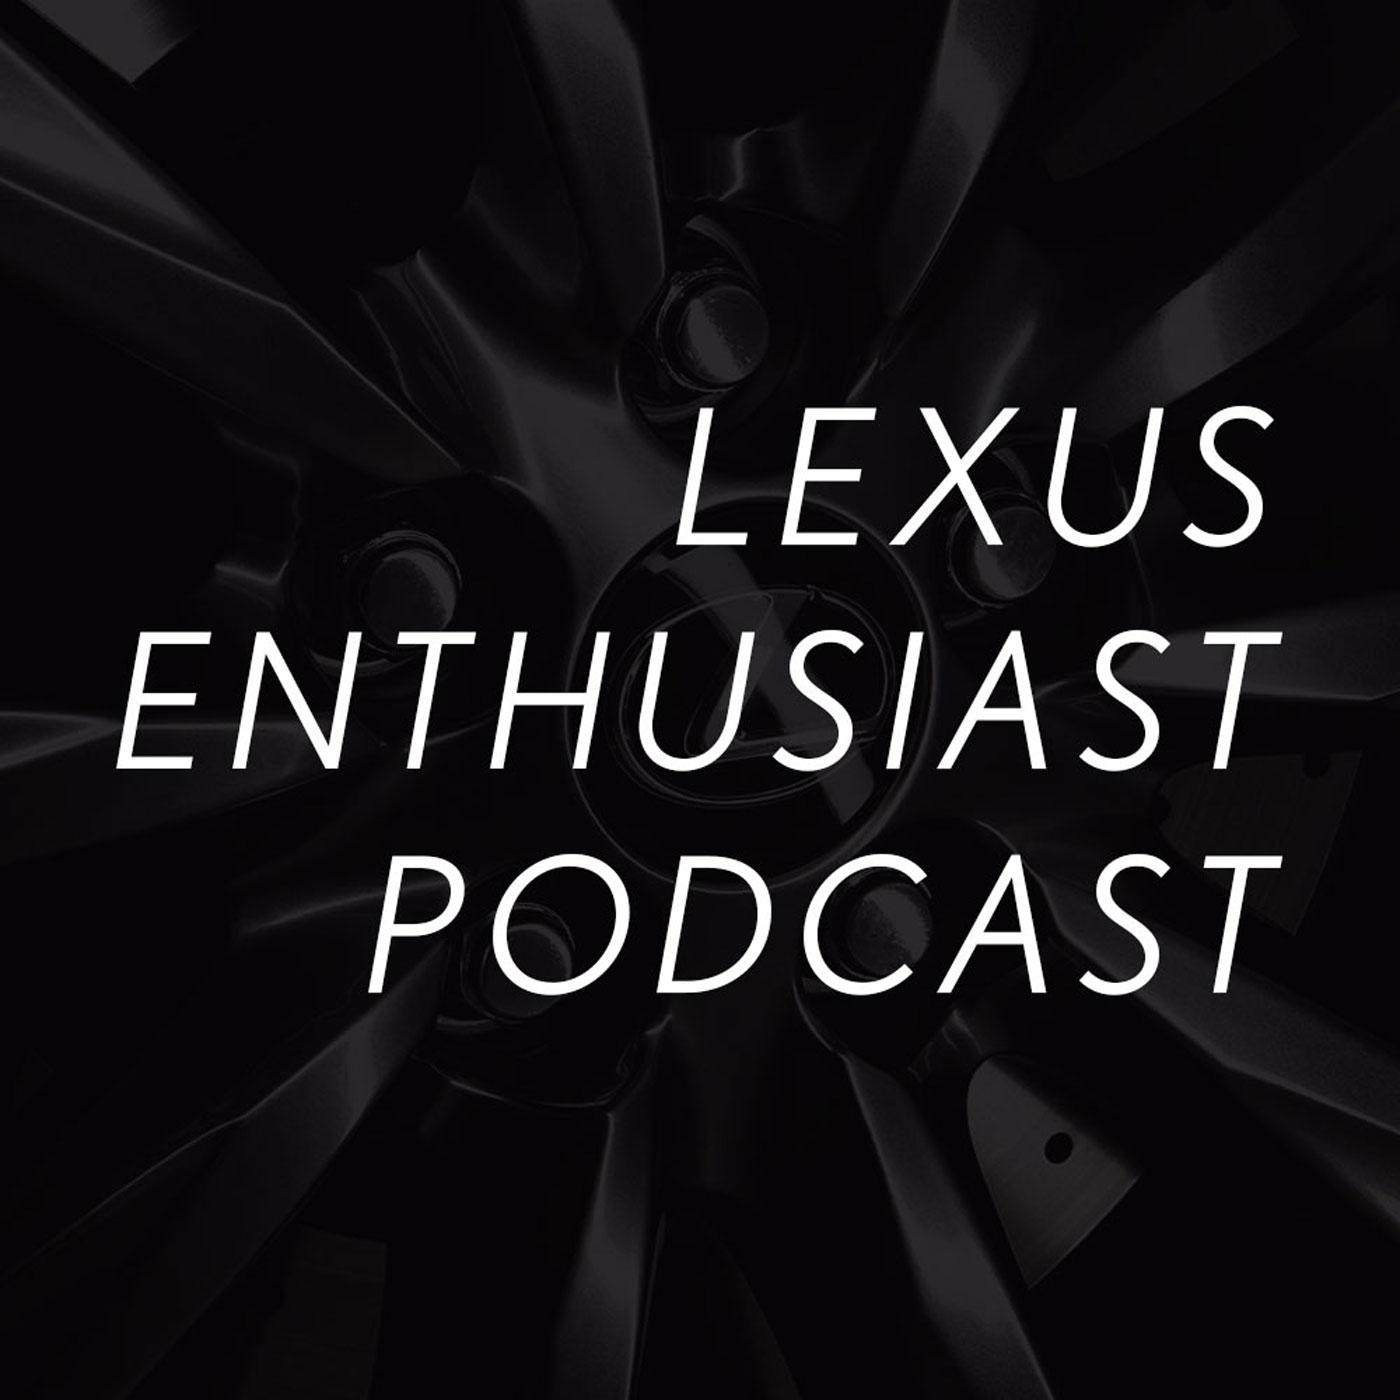 Lexus Enthusiast